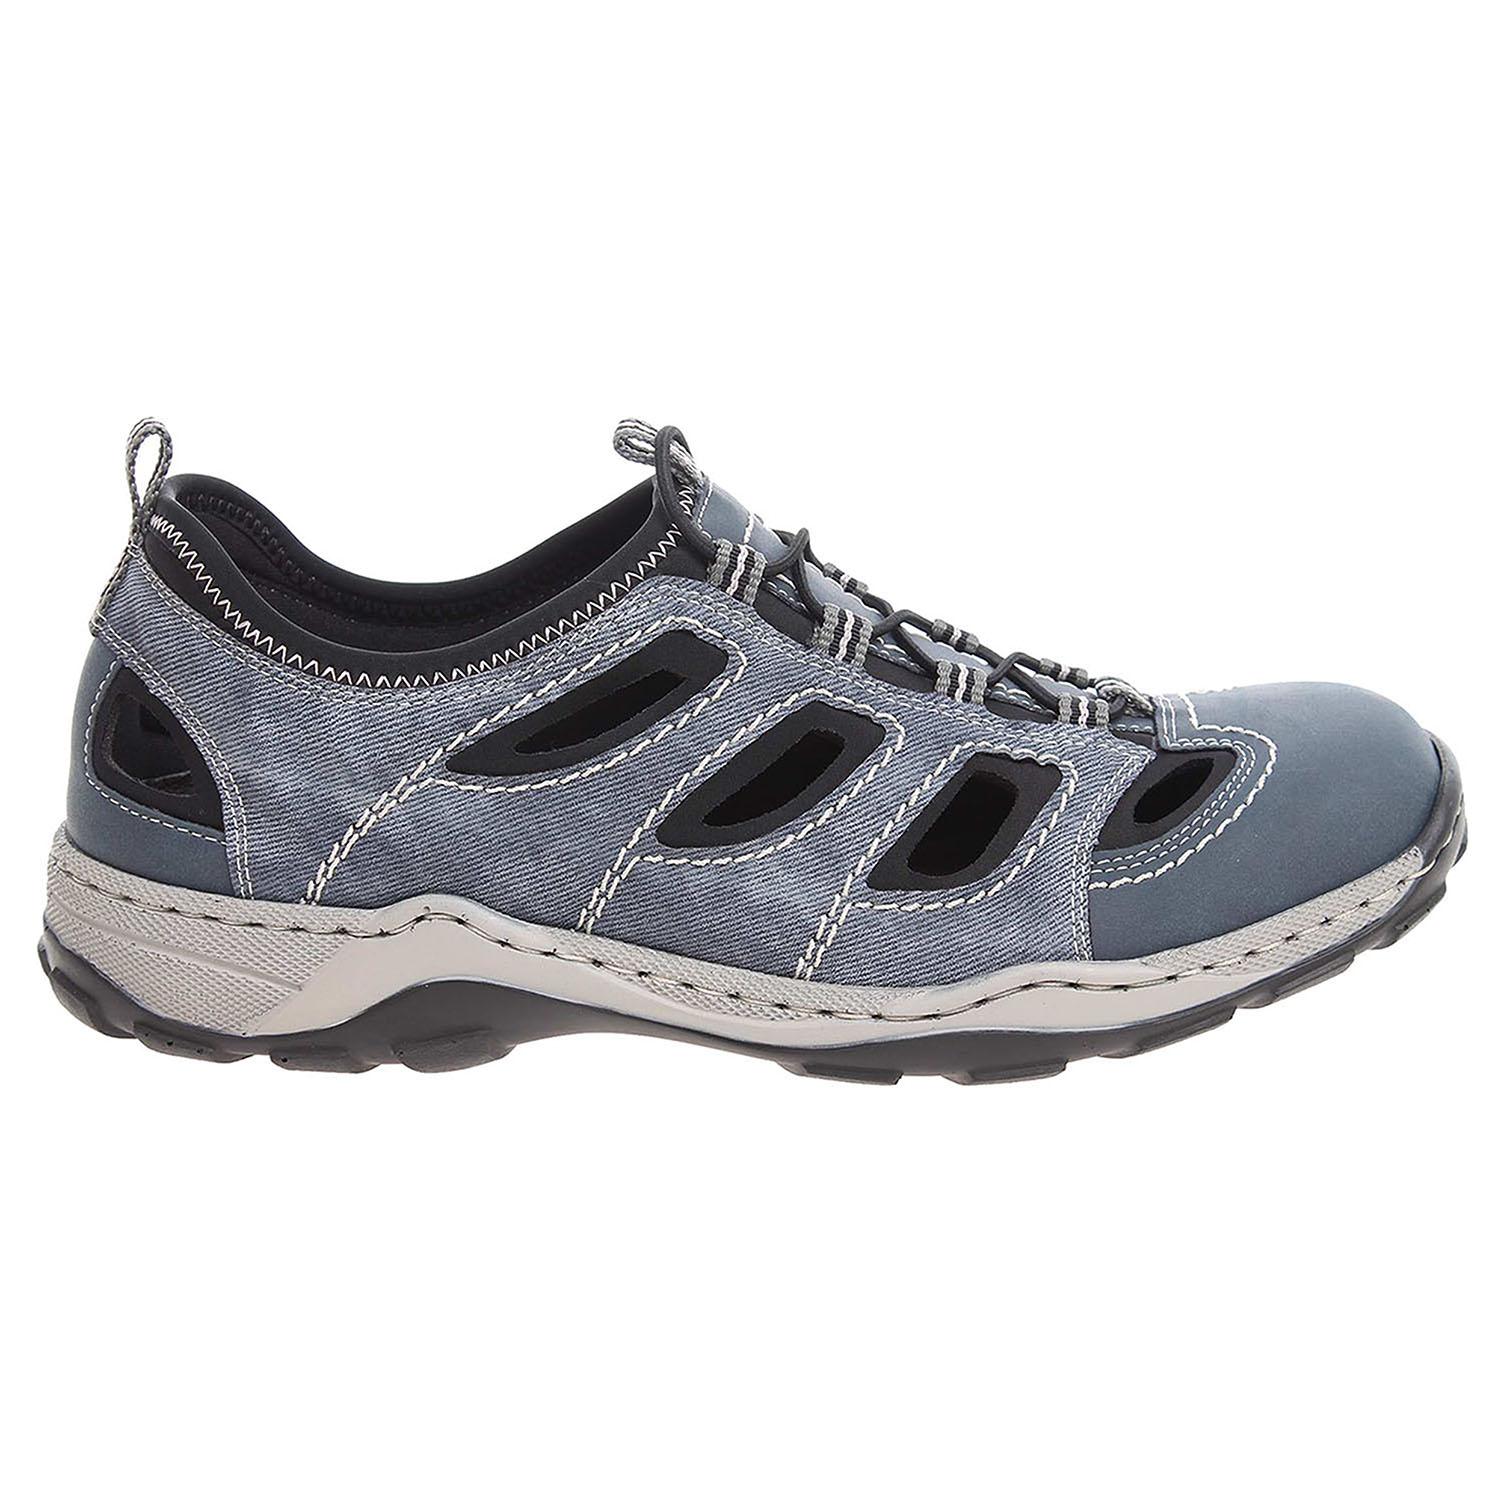 Ecco Rieker pánské sandály 08065-14 modré 24700224